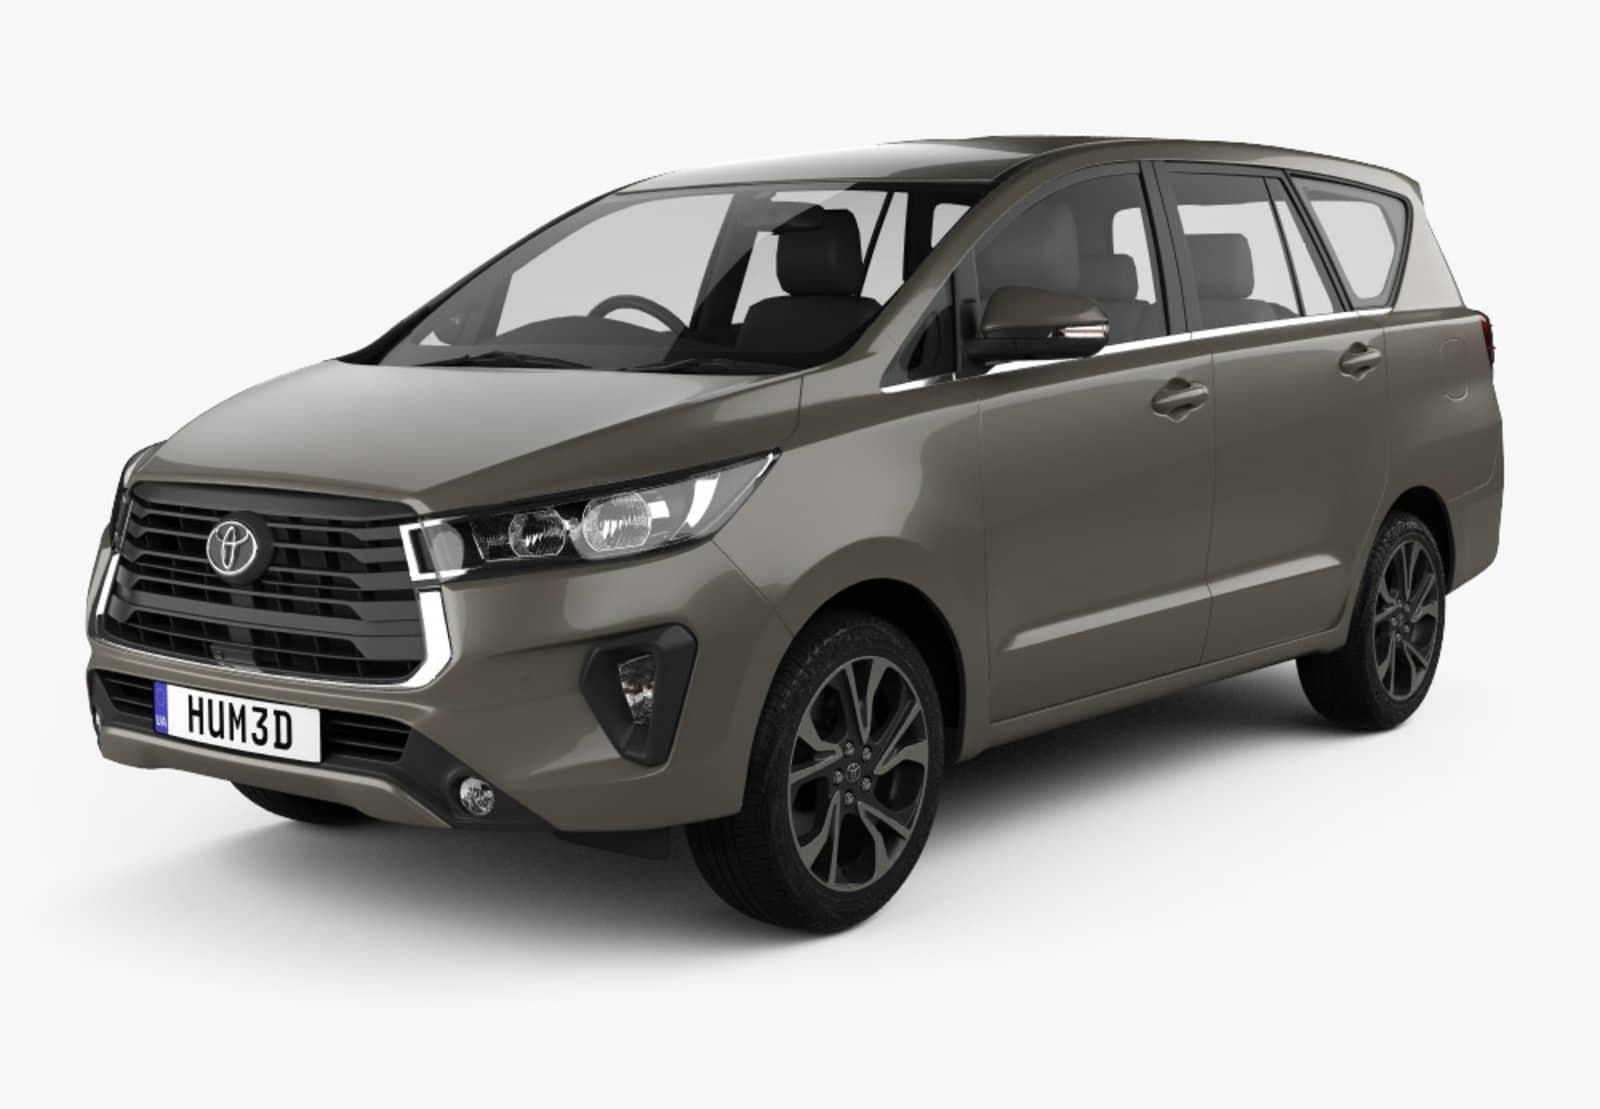 toyota innova facelift front 2021 muaxegiatot vn Đánh giá xe Toyota Innova 2021 kèm giá bán #1